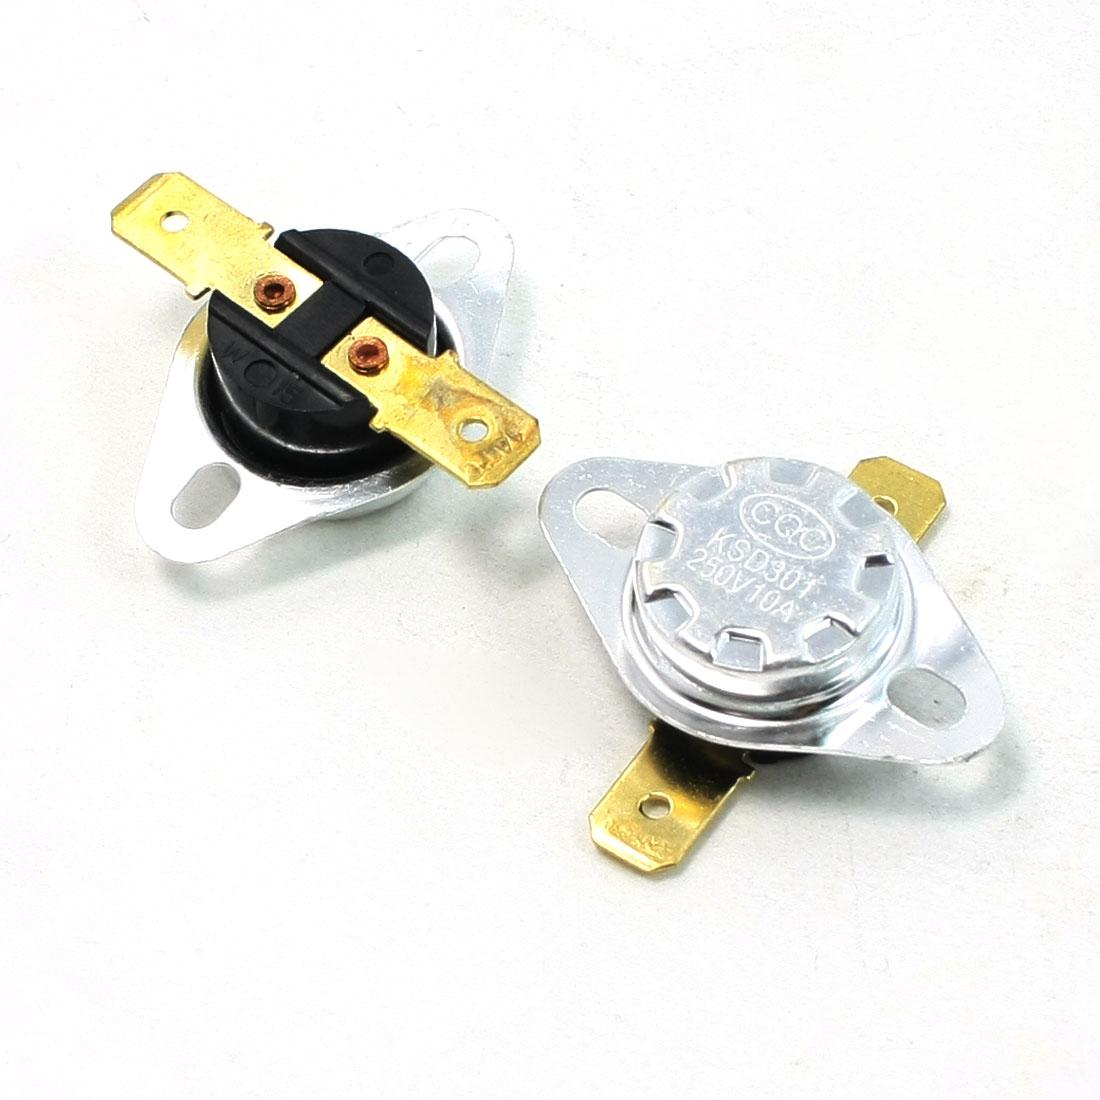 2 Pcs 140C Celsius N/C 2 Pin Soldering Temperature Control Switch 10A AC 250V